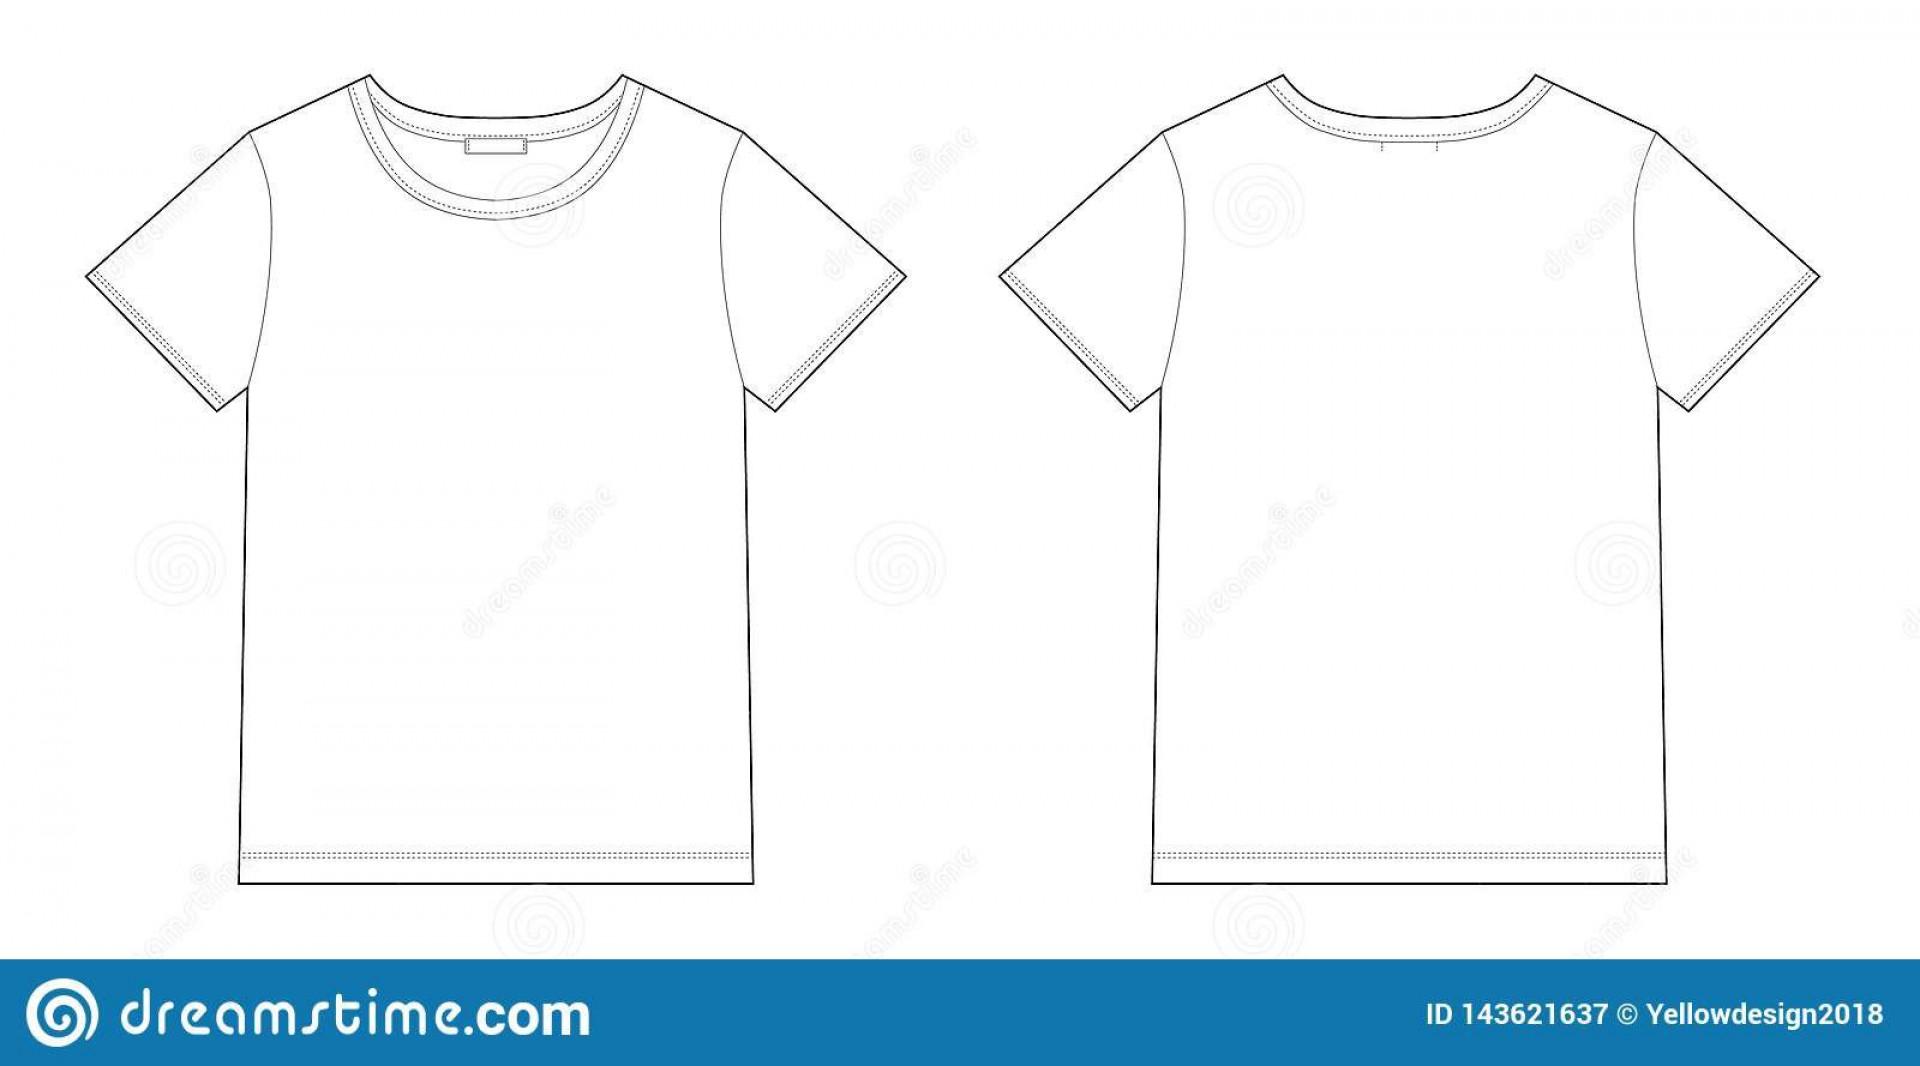 006 Surprising T Shirt Design Template Free High Resolution  Psd Download1920